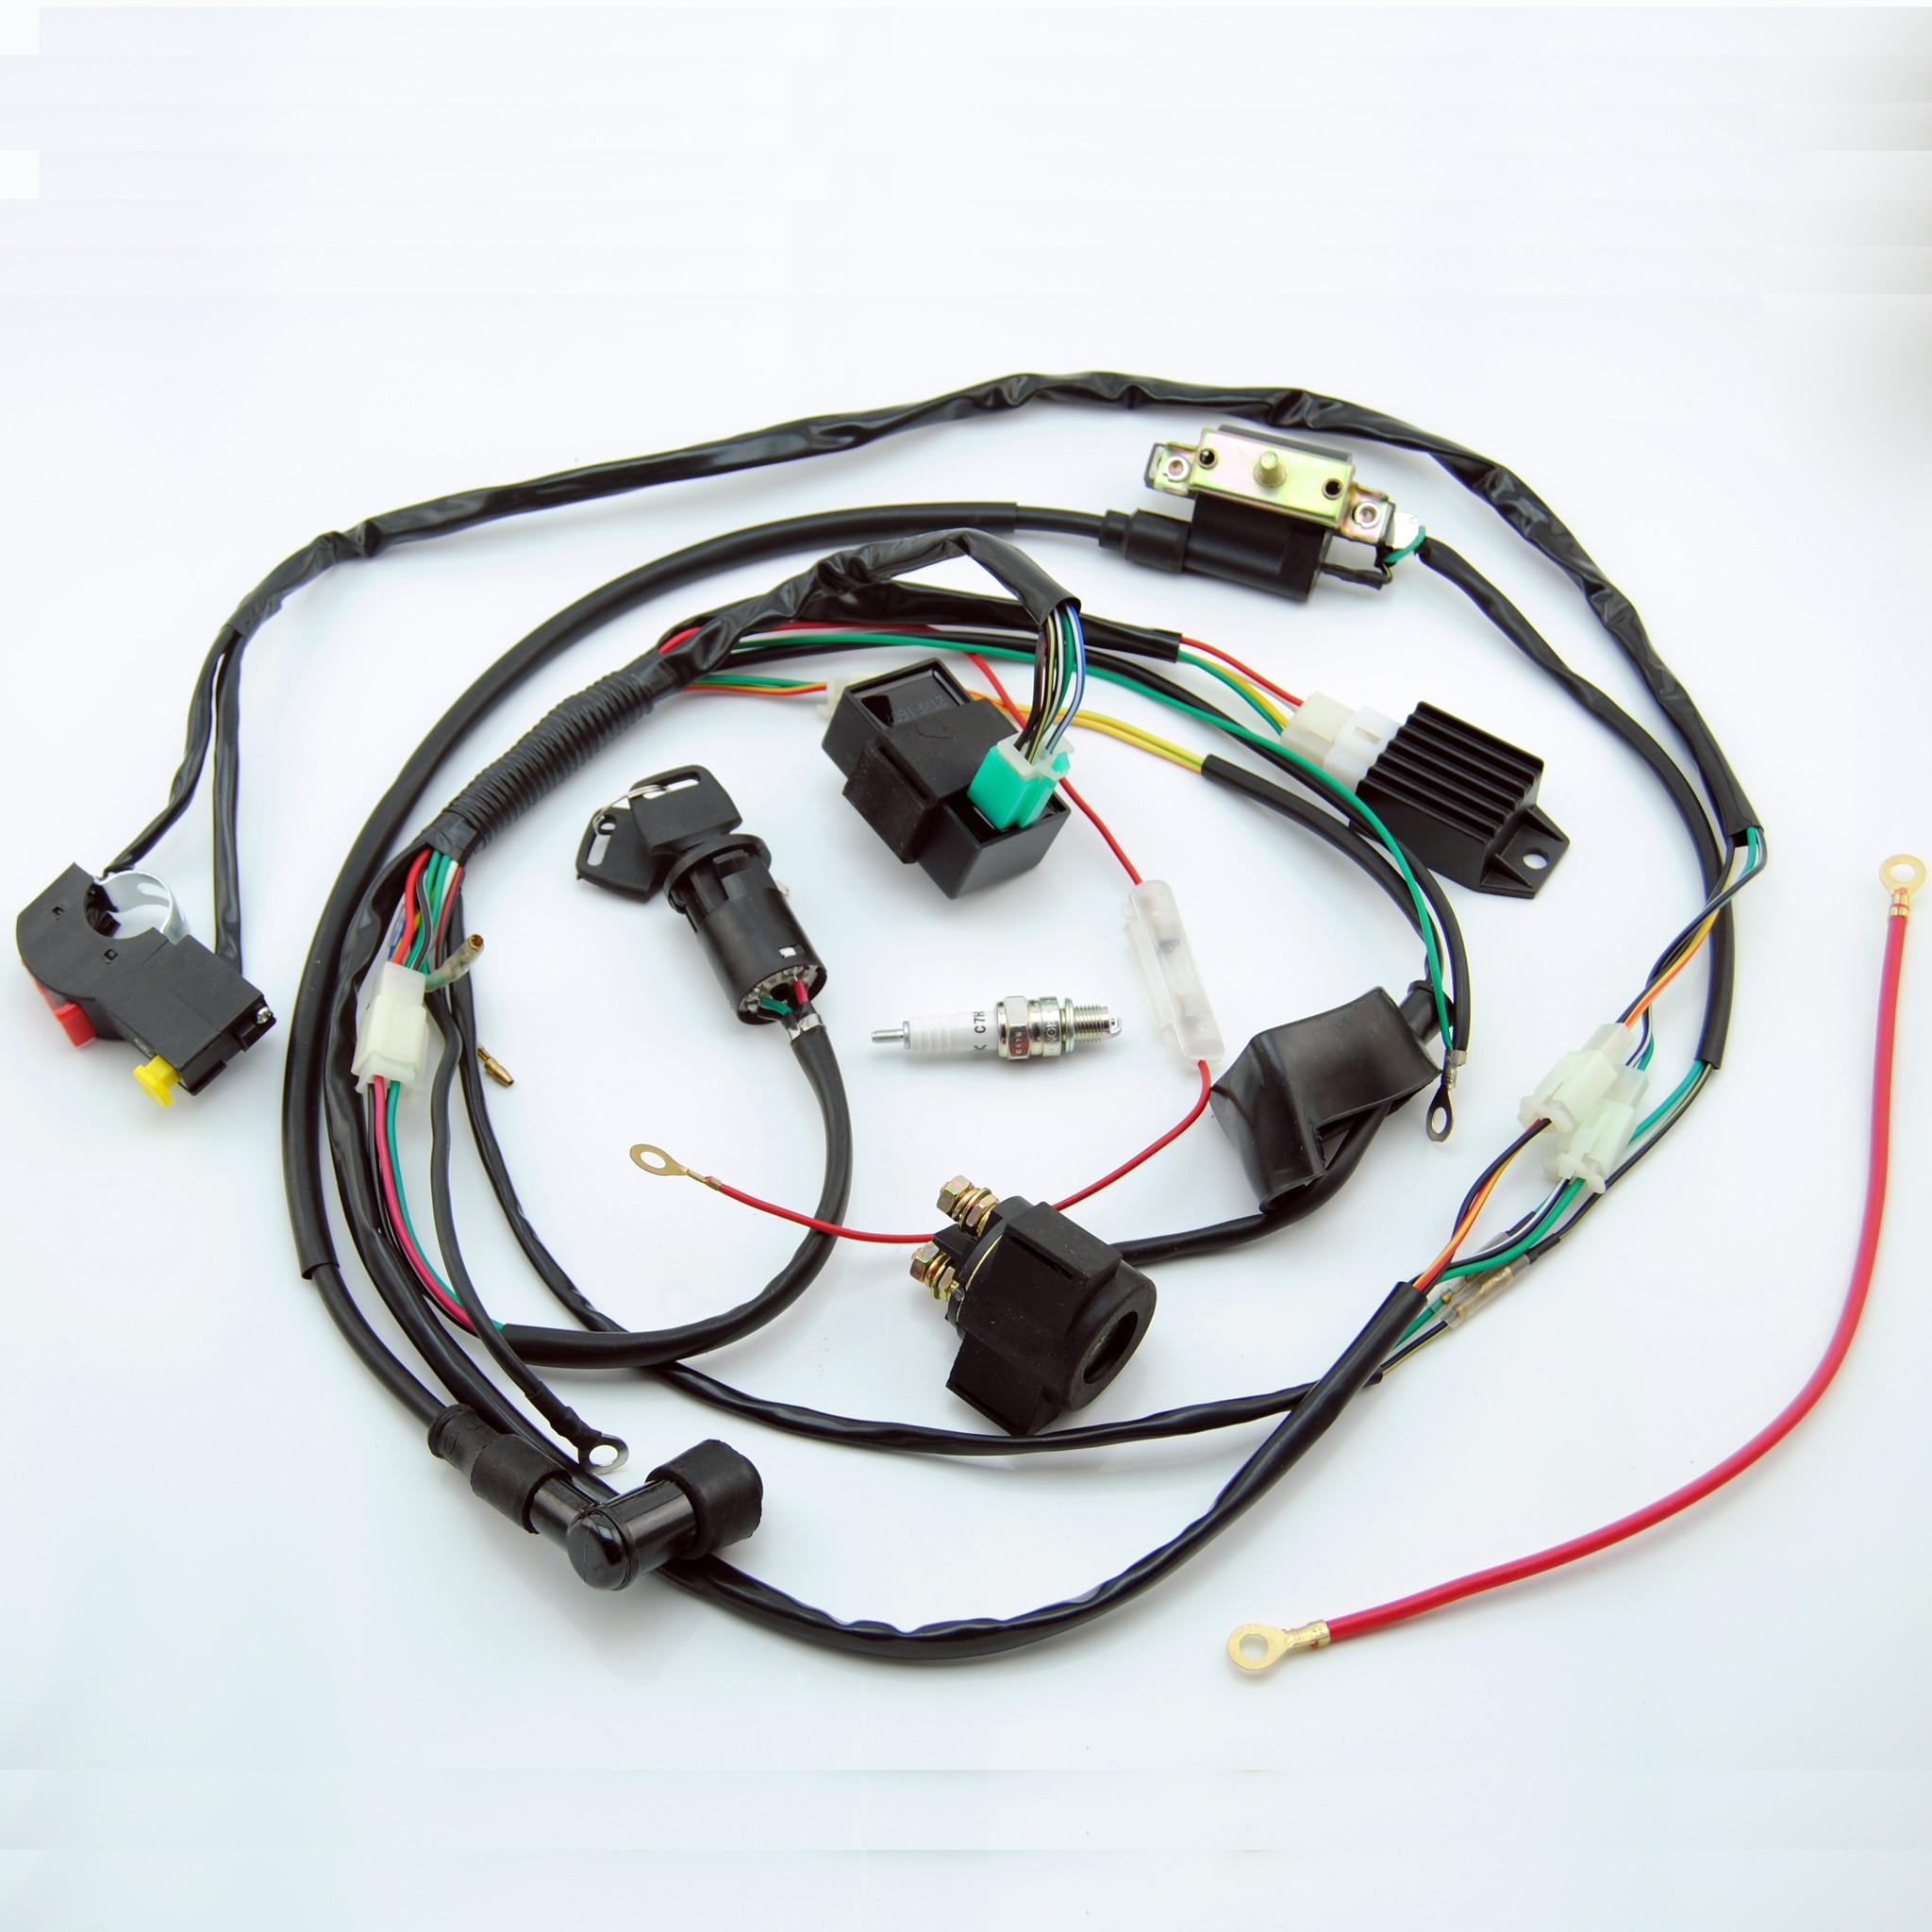 medium resolution of complete electric start engine wiring harness loom 110 125cc quad bike atv buggy free shipping